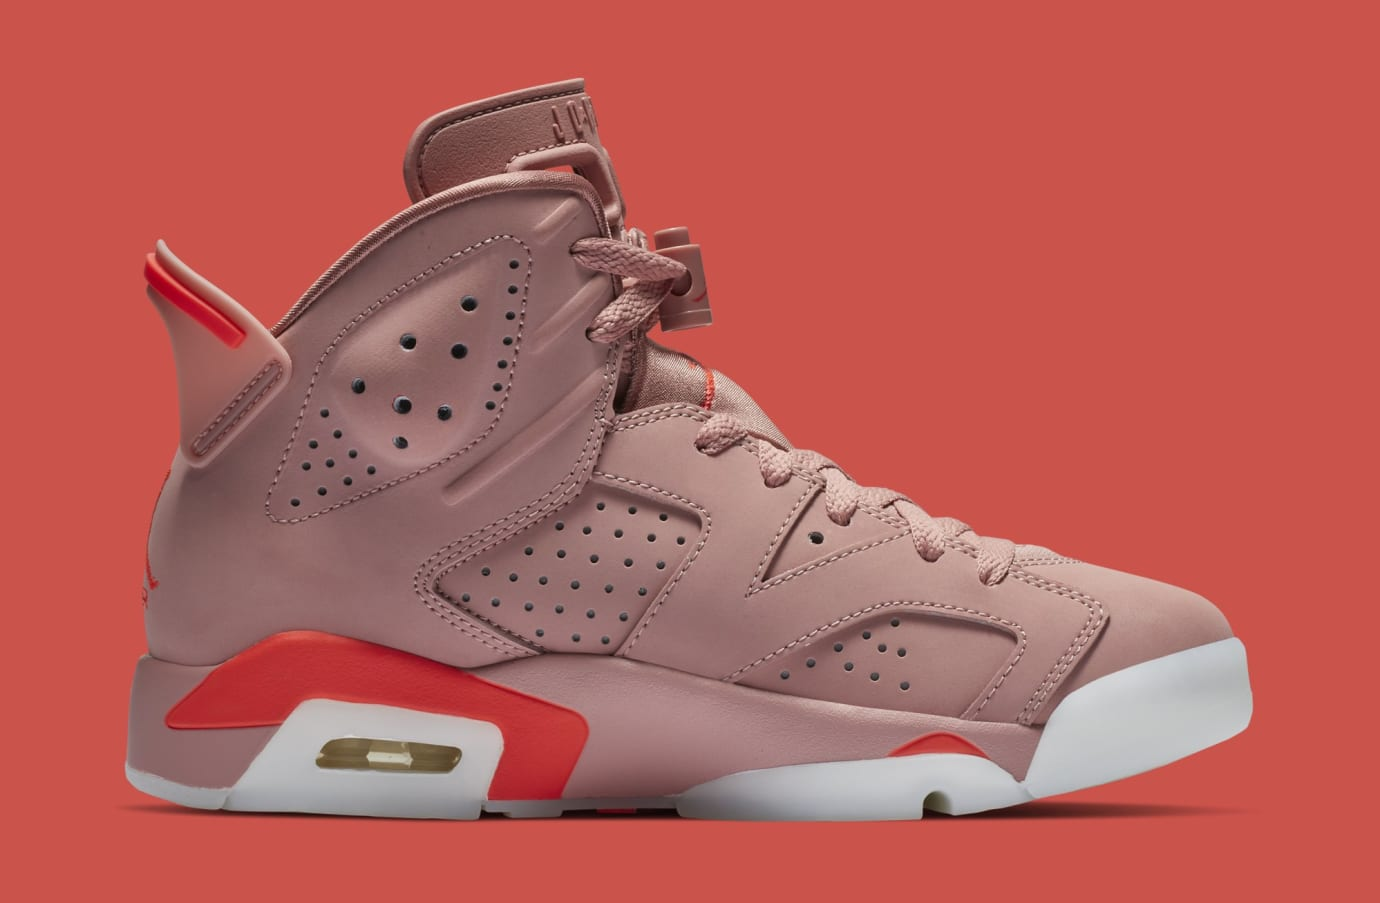 best website fcf82 94fc7 Image via Nike Aleali May x Air Jordan 6  Rust Pink Bright Crimson   CI0550-600